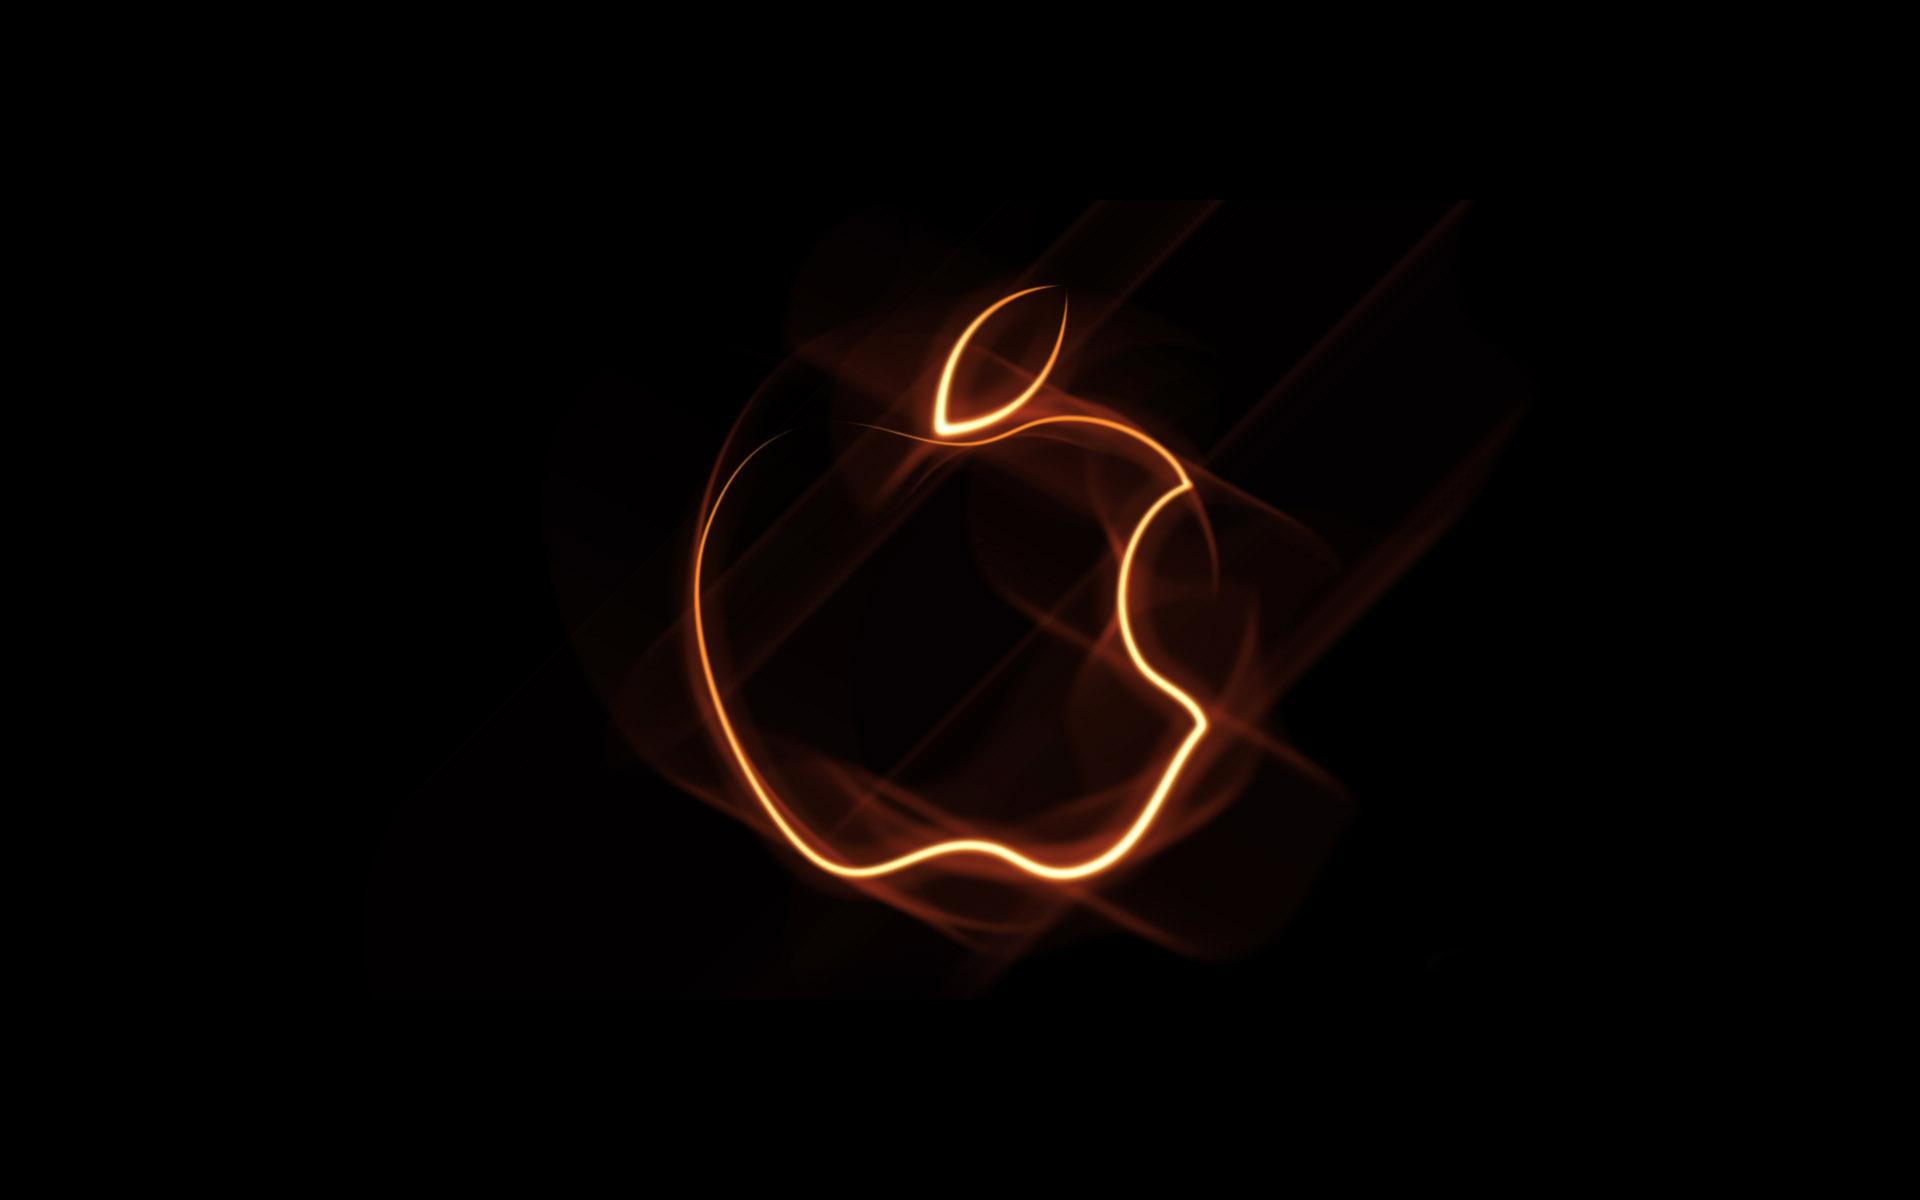 Cool Apple Logo   Cool Desktop Backgrounds 1920x1200